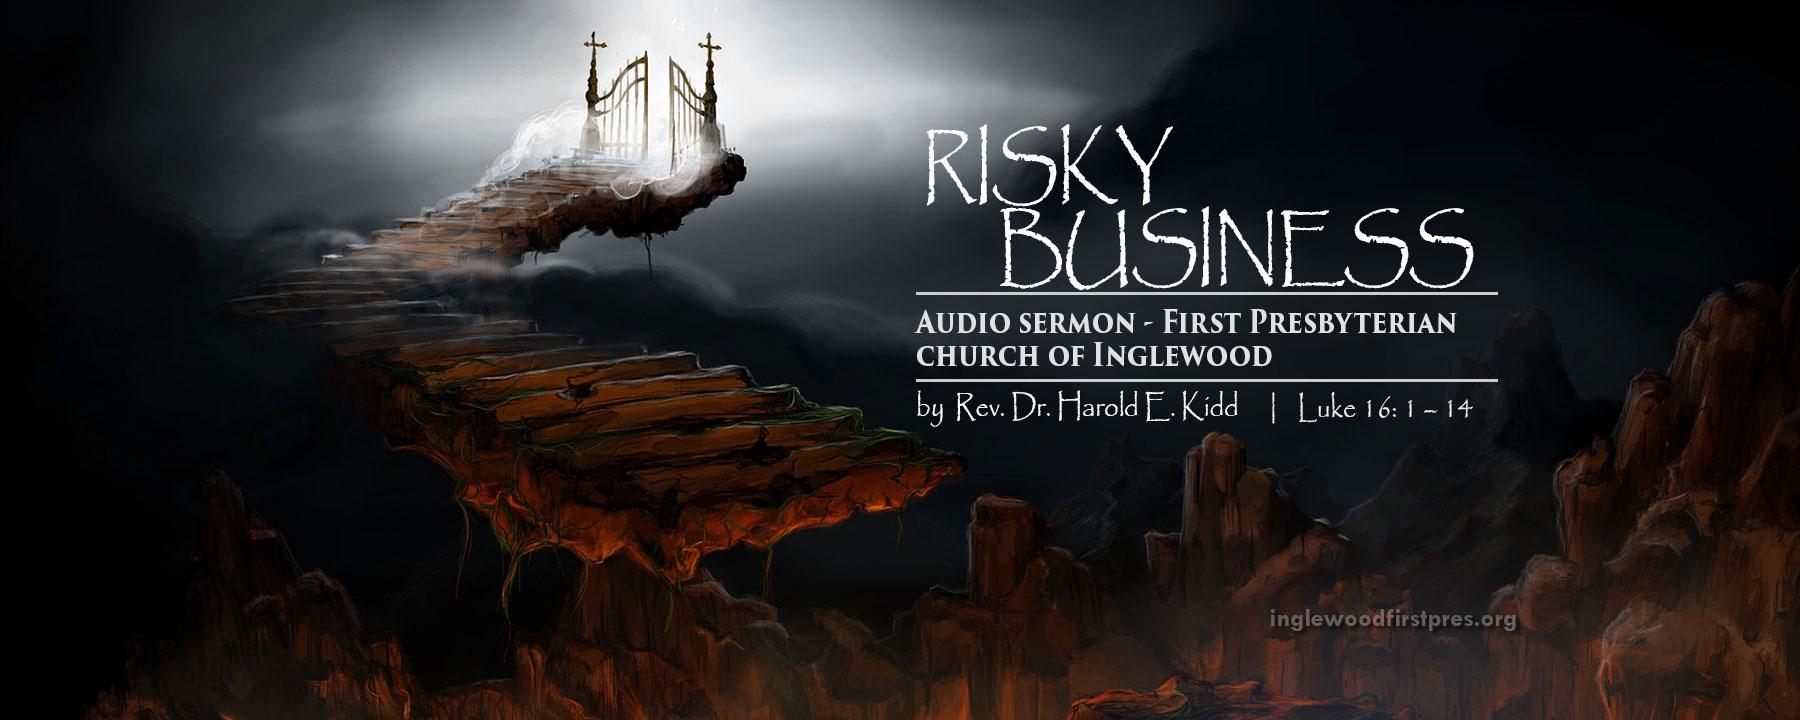 AUDIO SERMON: Risky Business by Rev. Dr. Harold E. Kidd (Luke 16: 1 – 14)